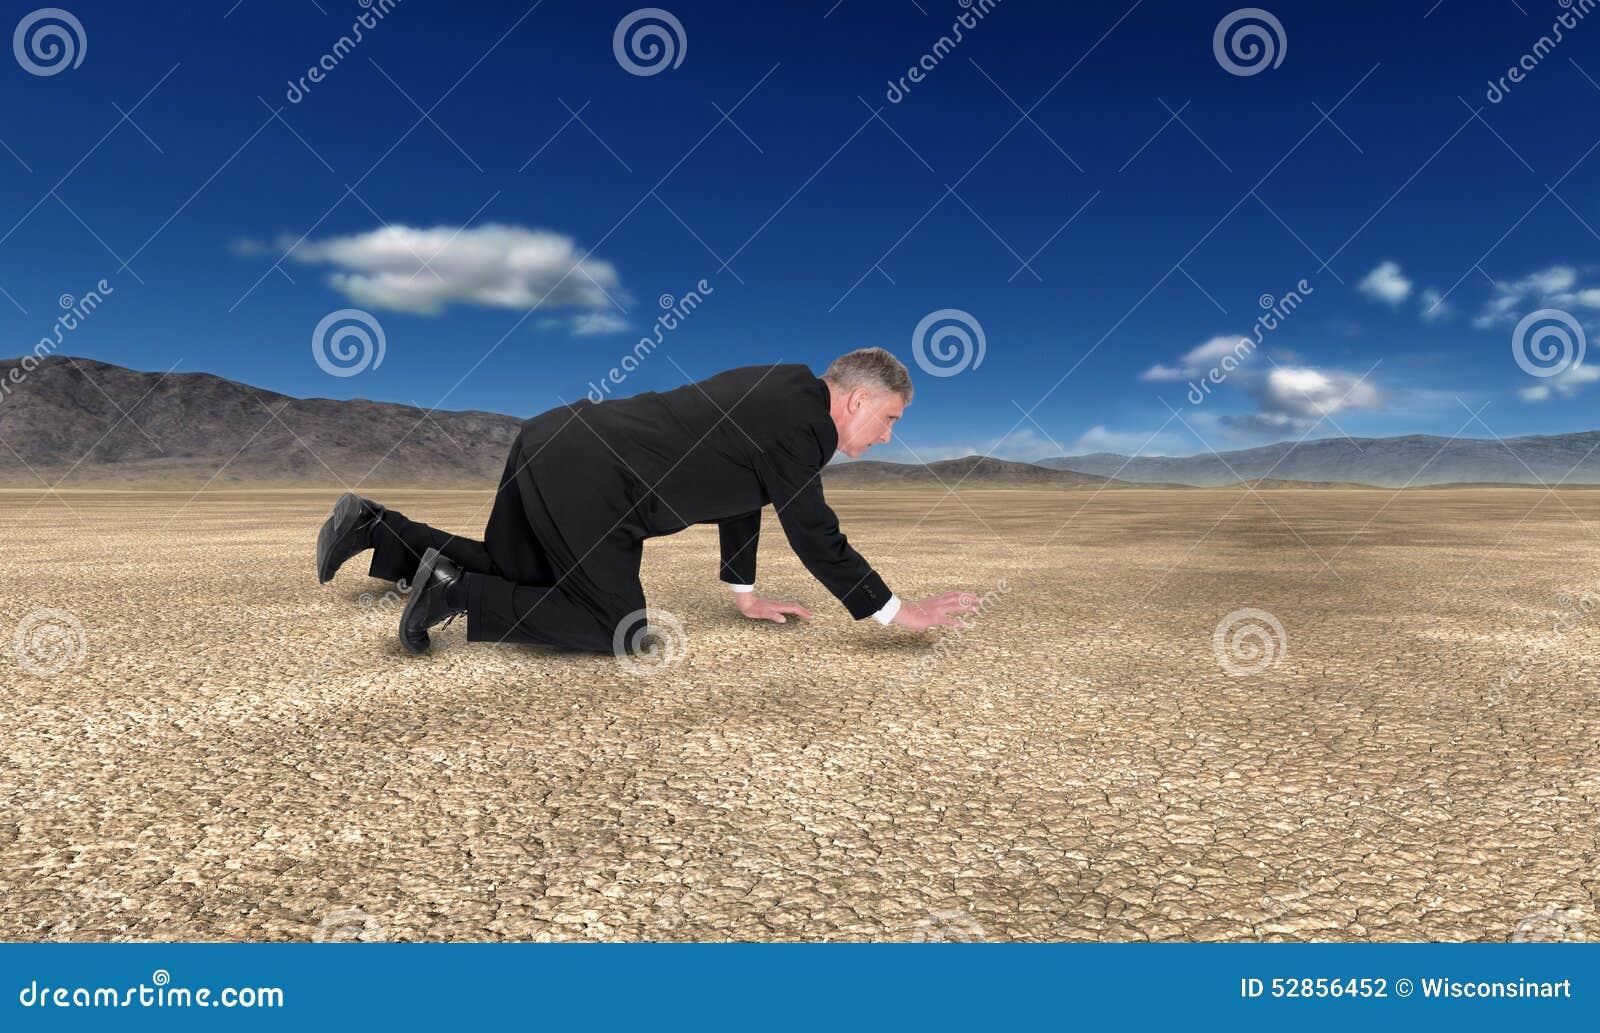 Business, Sales, Marketing, Desert, Man Crawling